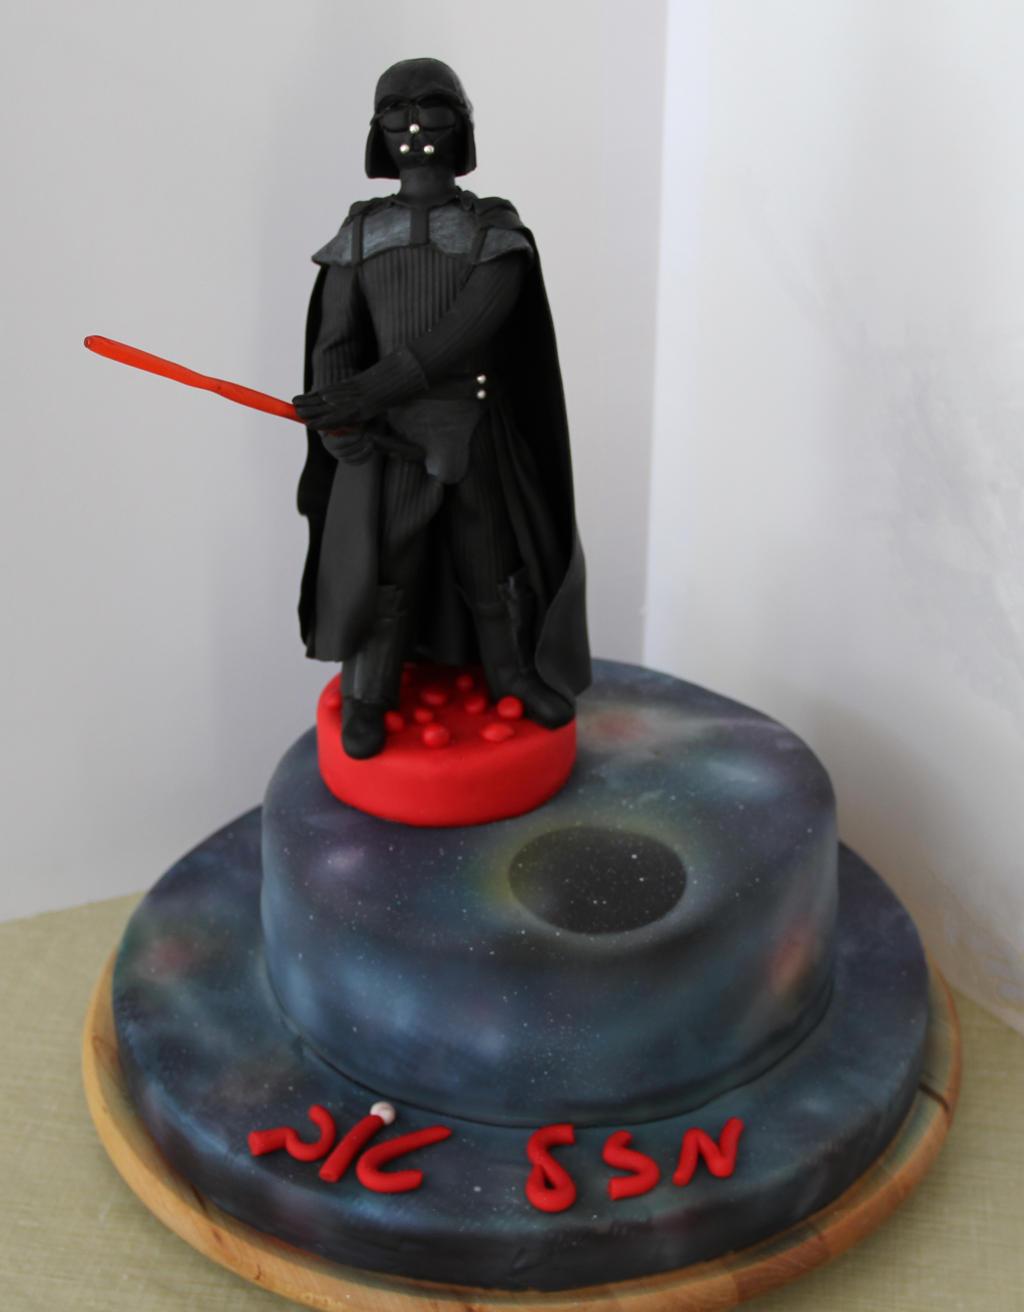 Darth Vader Cake by mysweetstop on DeviantArt